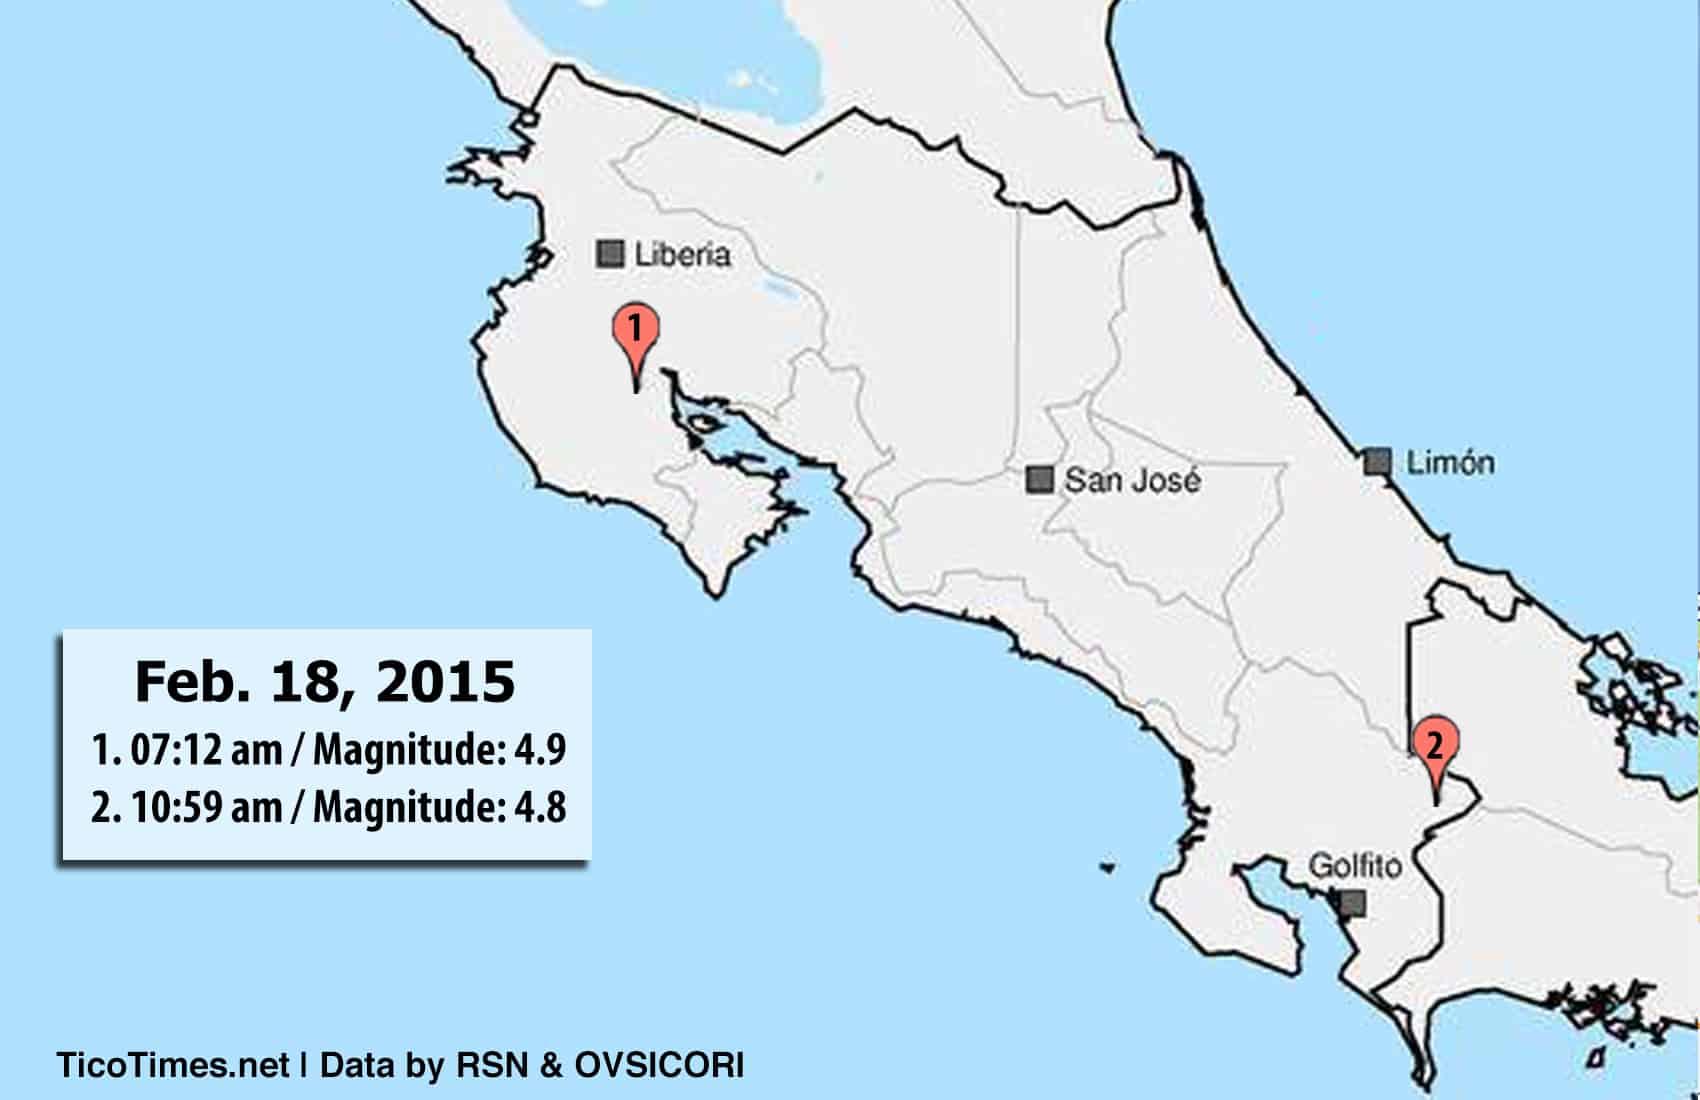 Quakes Feb. 18, 2015